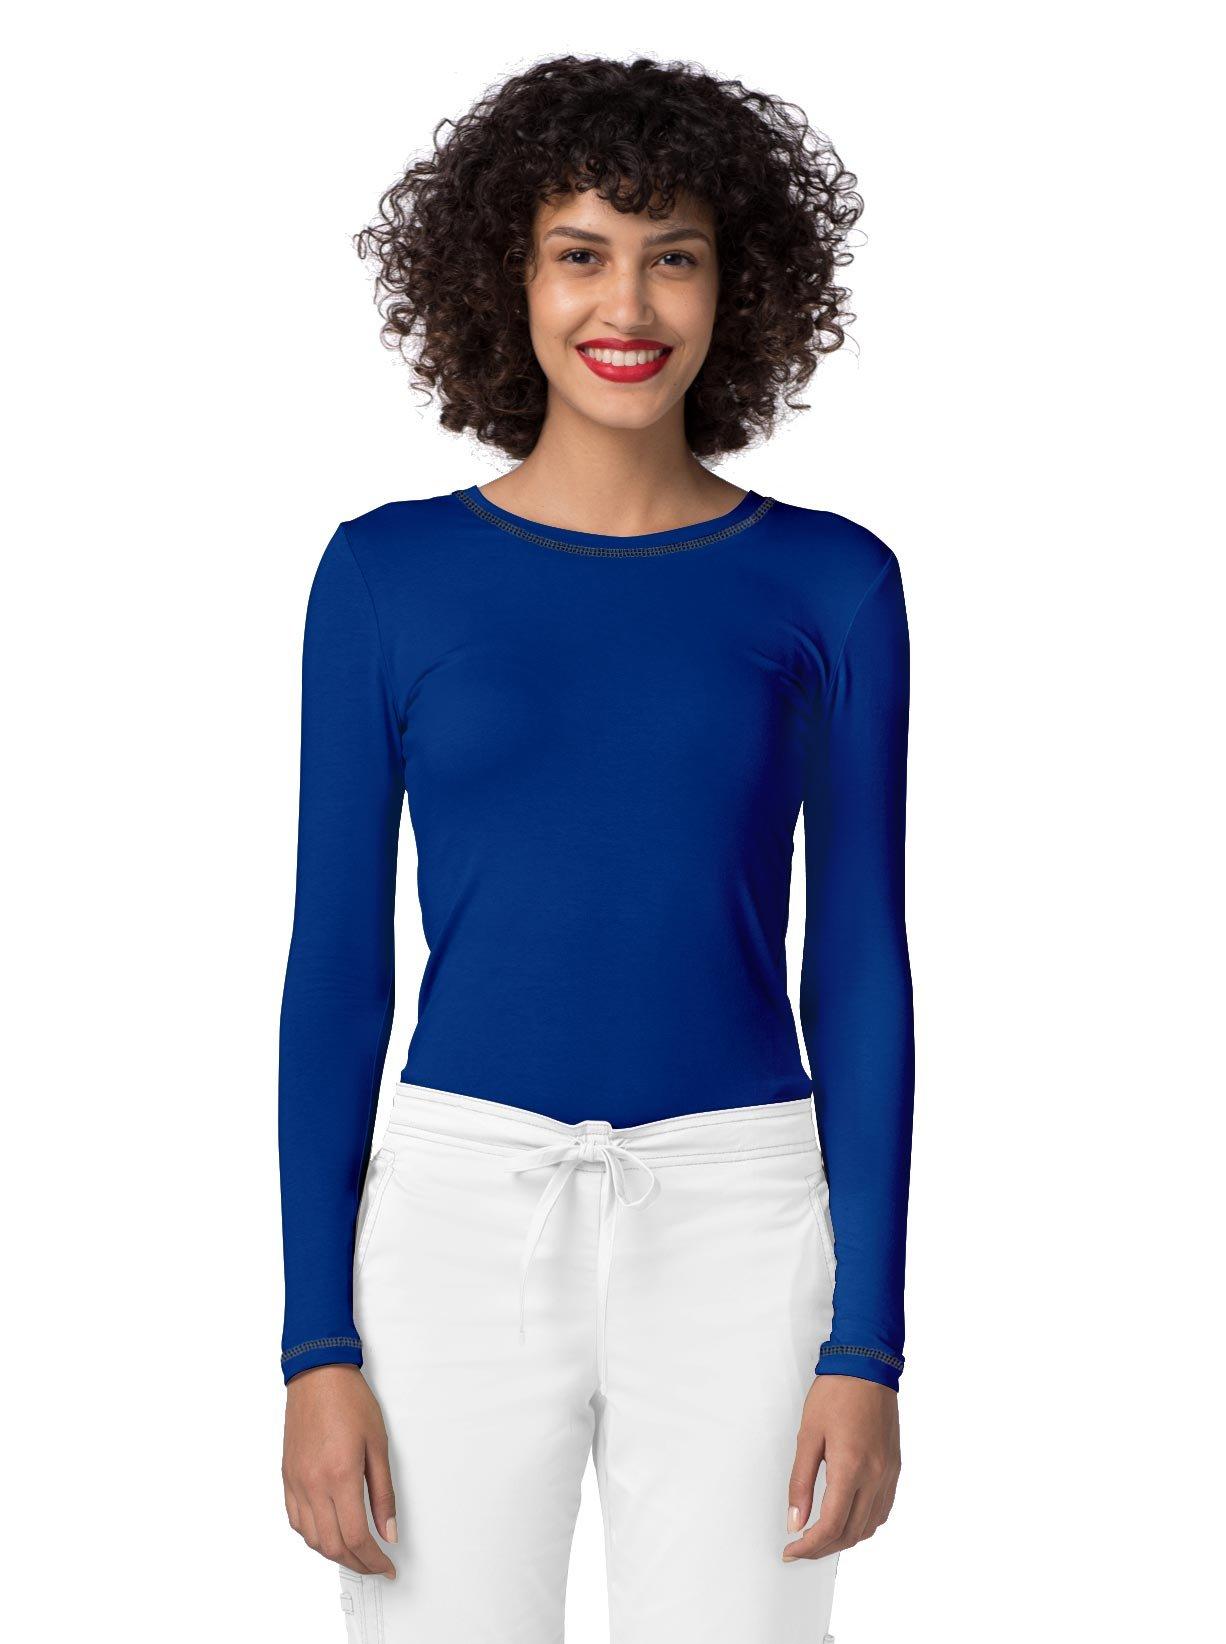 Adar Womens Comfort Long Sleeve Fitted T-Shirt Underscrub Tee- 3400 - Royal Blue - L by ADAR UNIFORMS (Image #4)